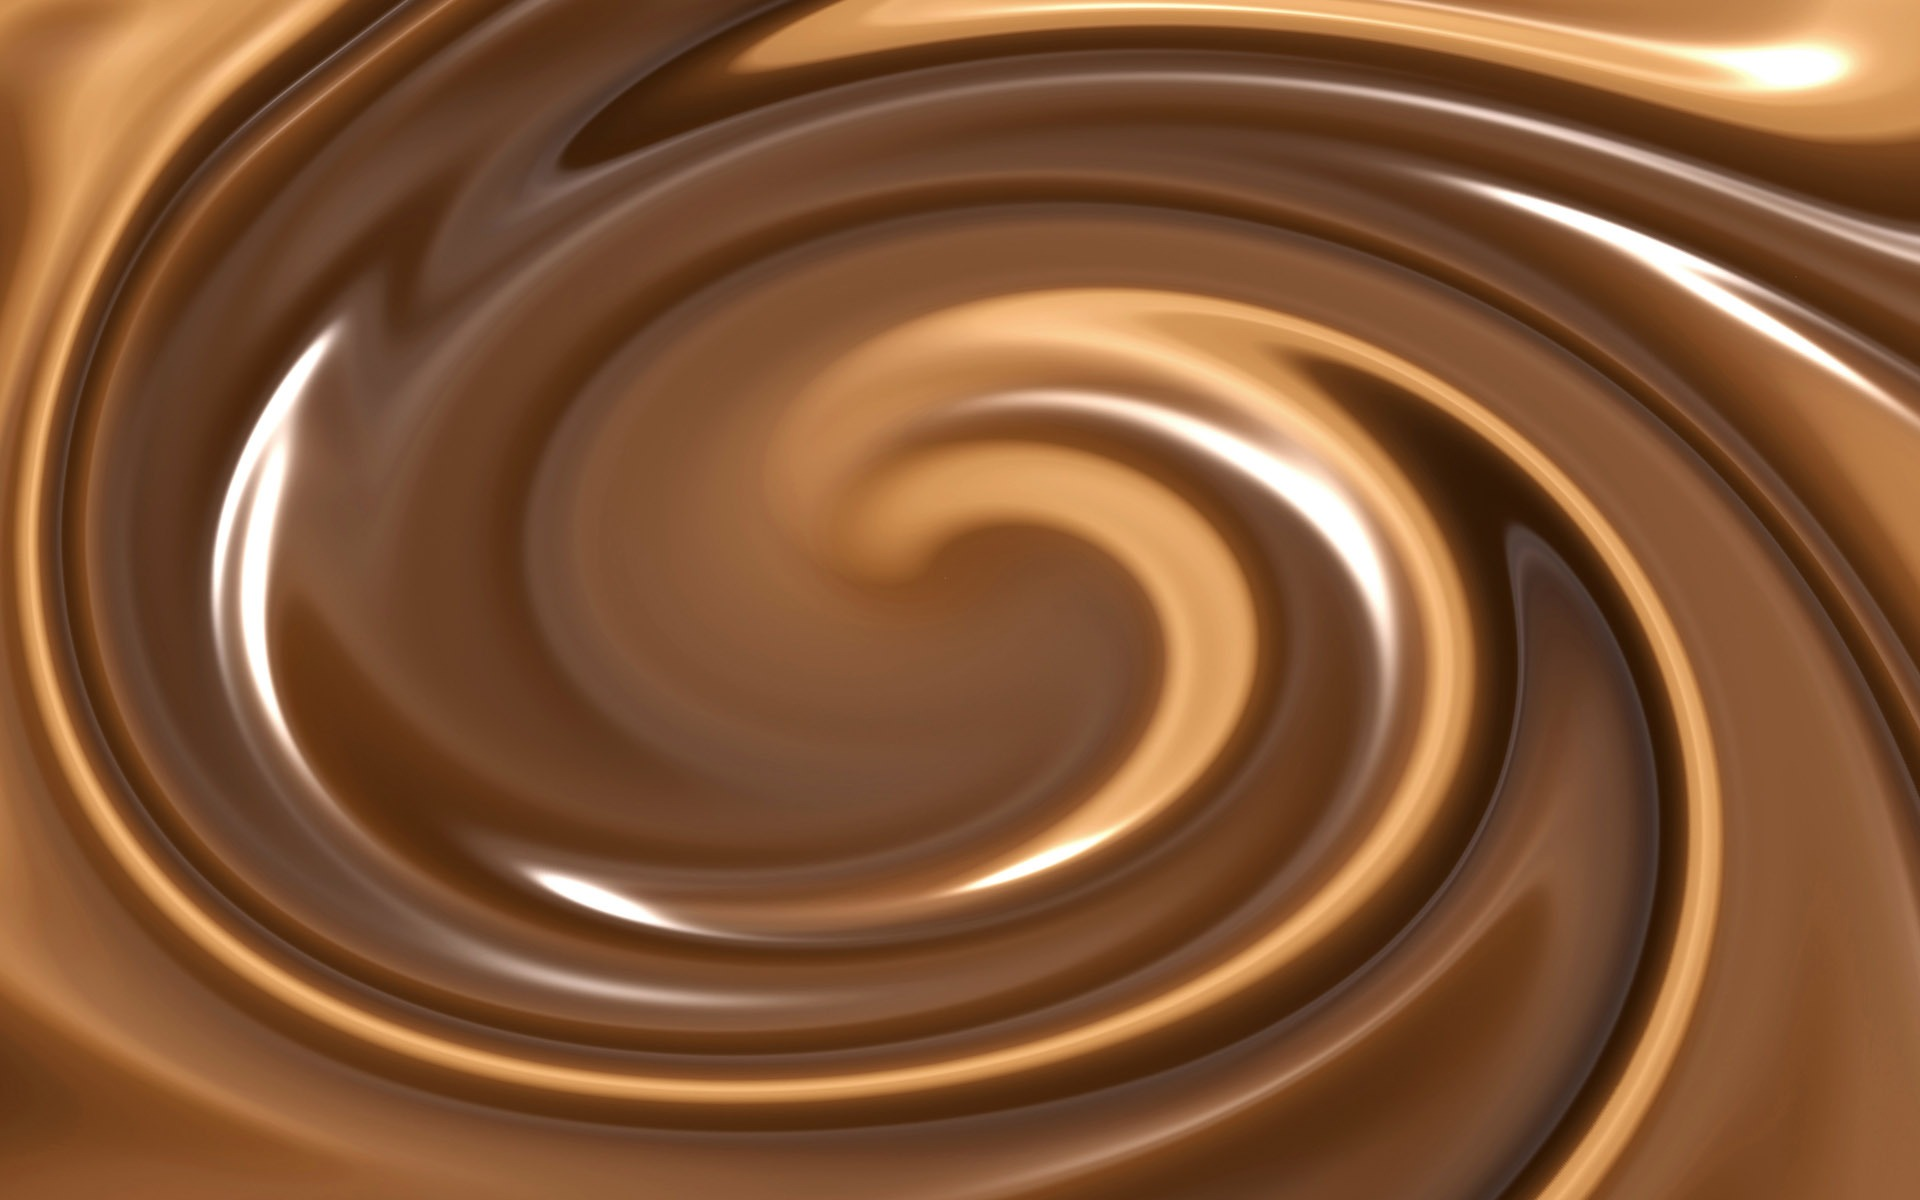 Fondos De Pantalla De Chocolates: 초콜릿 근접 벽지 (1) #10